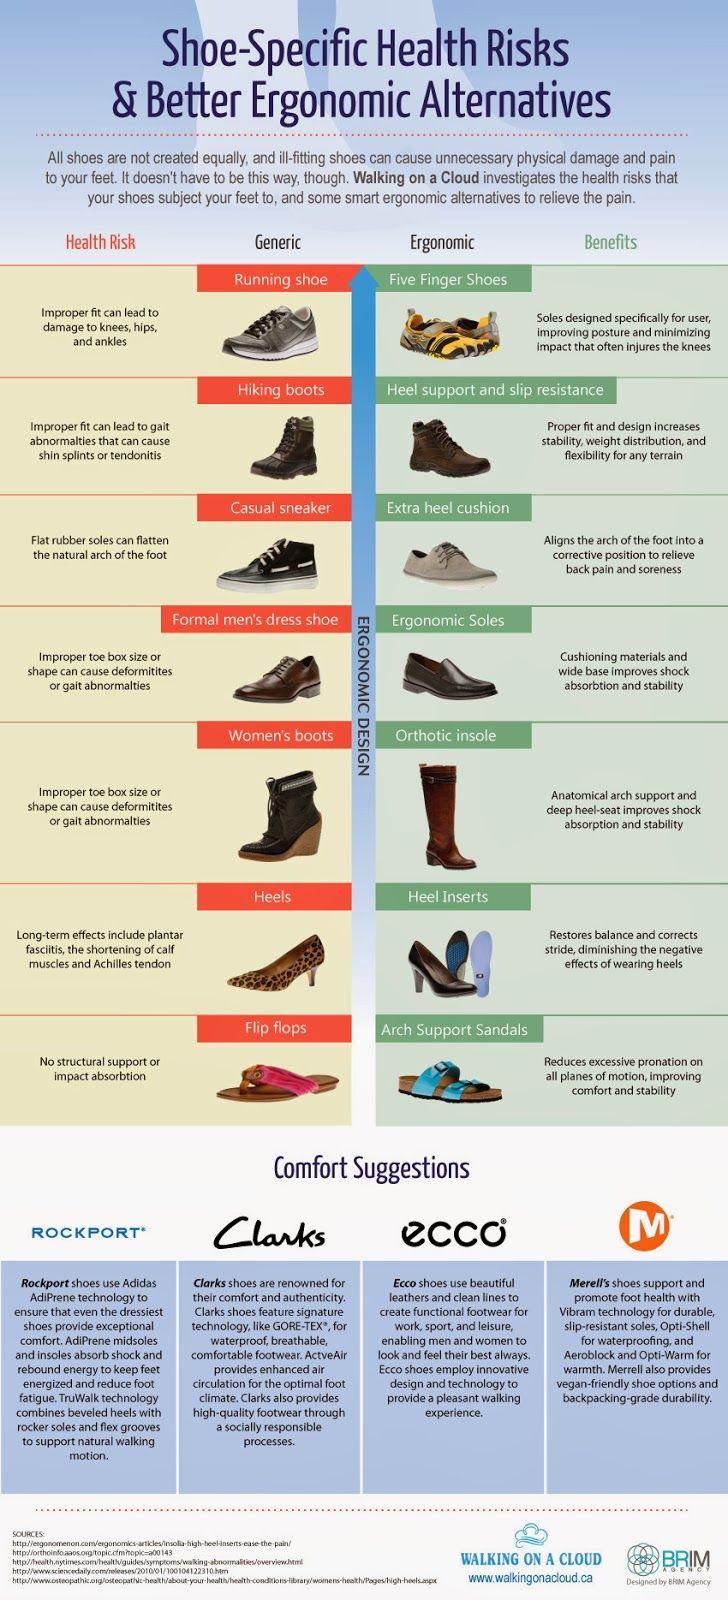 the-walking-shoe-blog.blogspot.com/2013/11/shoe-specific-health-risks